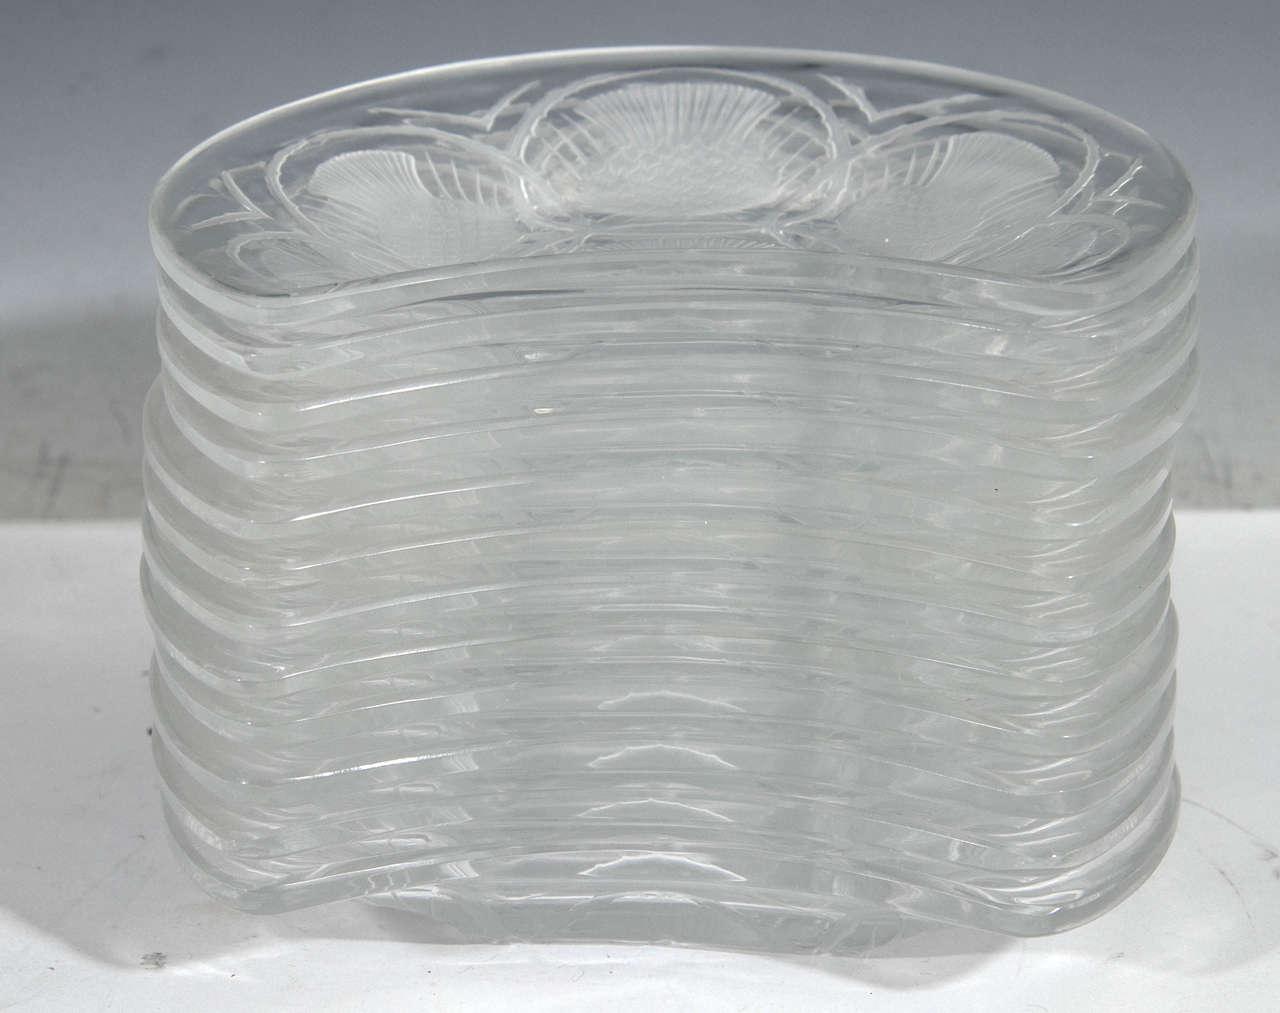 Vintage Set of 12 Lalique Crystal Chardon Thistle Dessert Plates 3